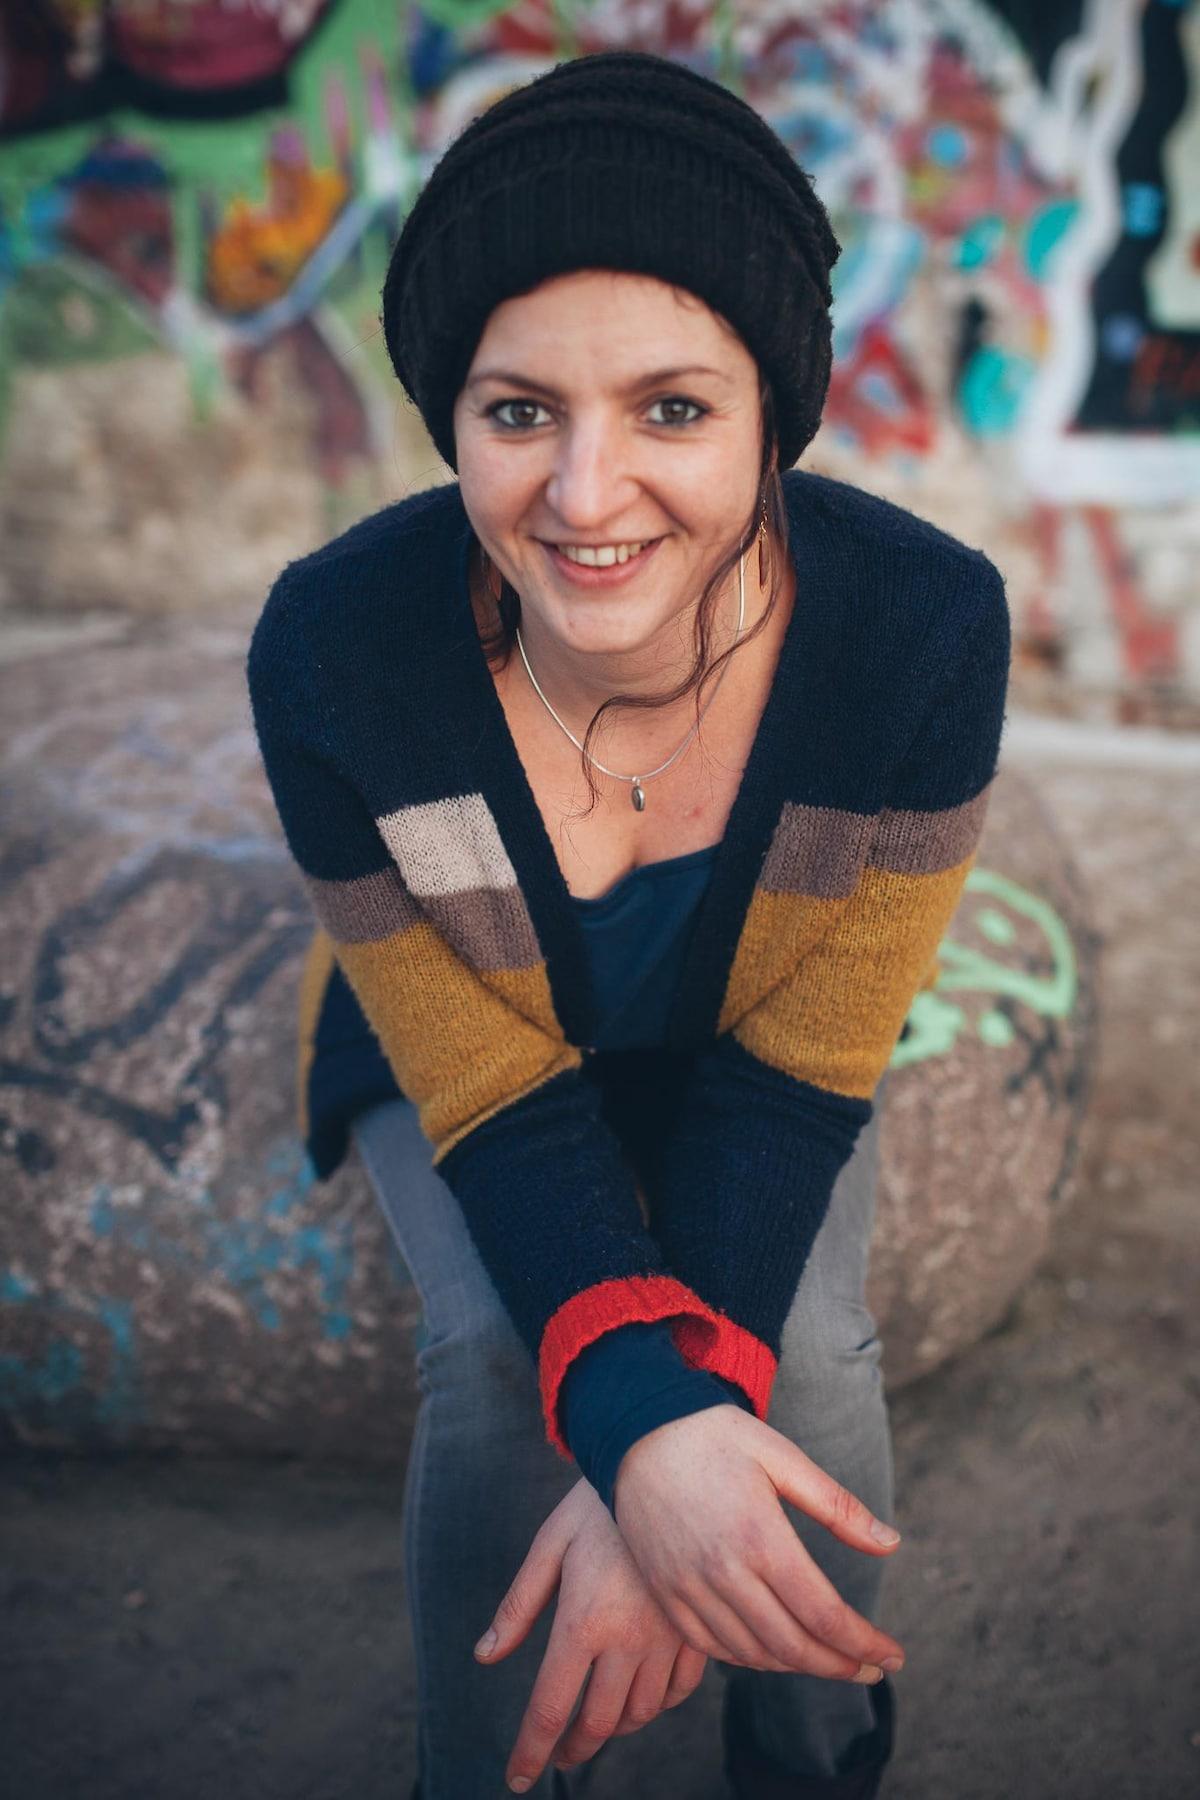 Rachel from Berlin